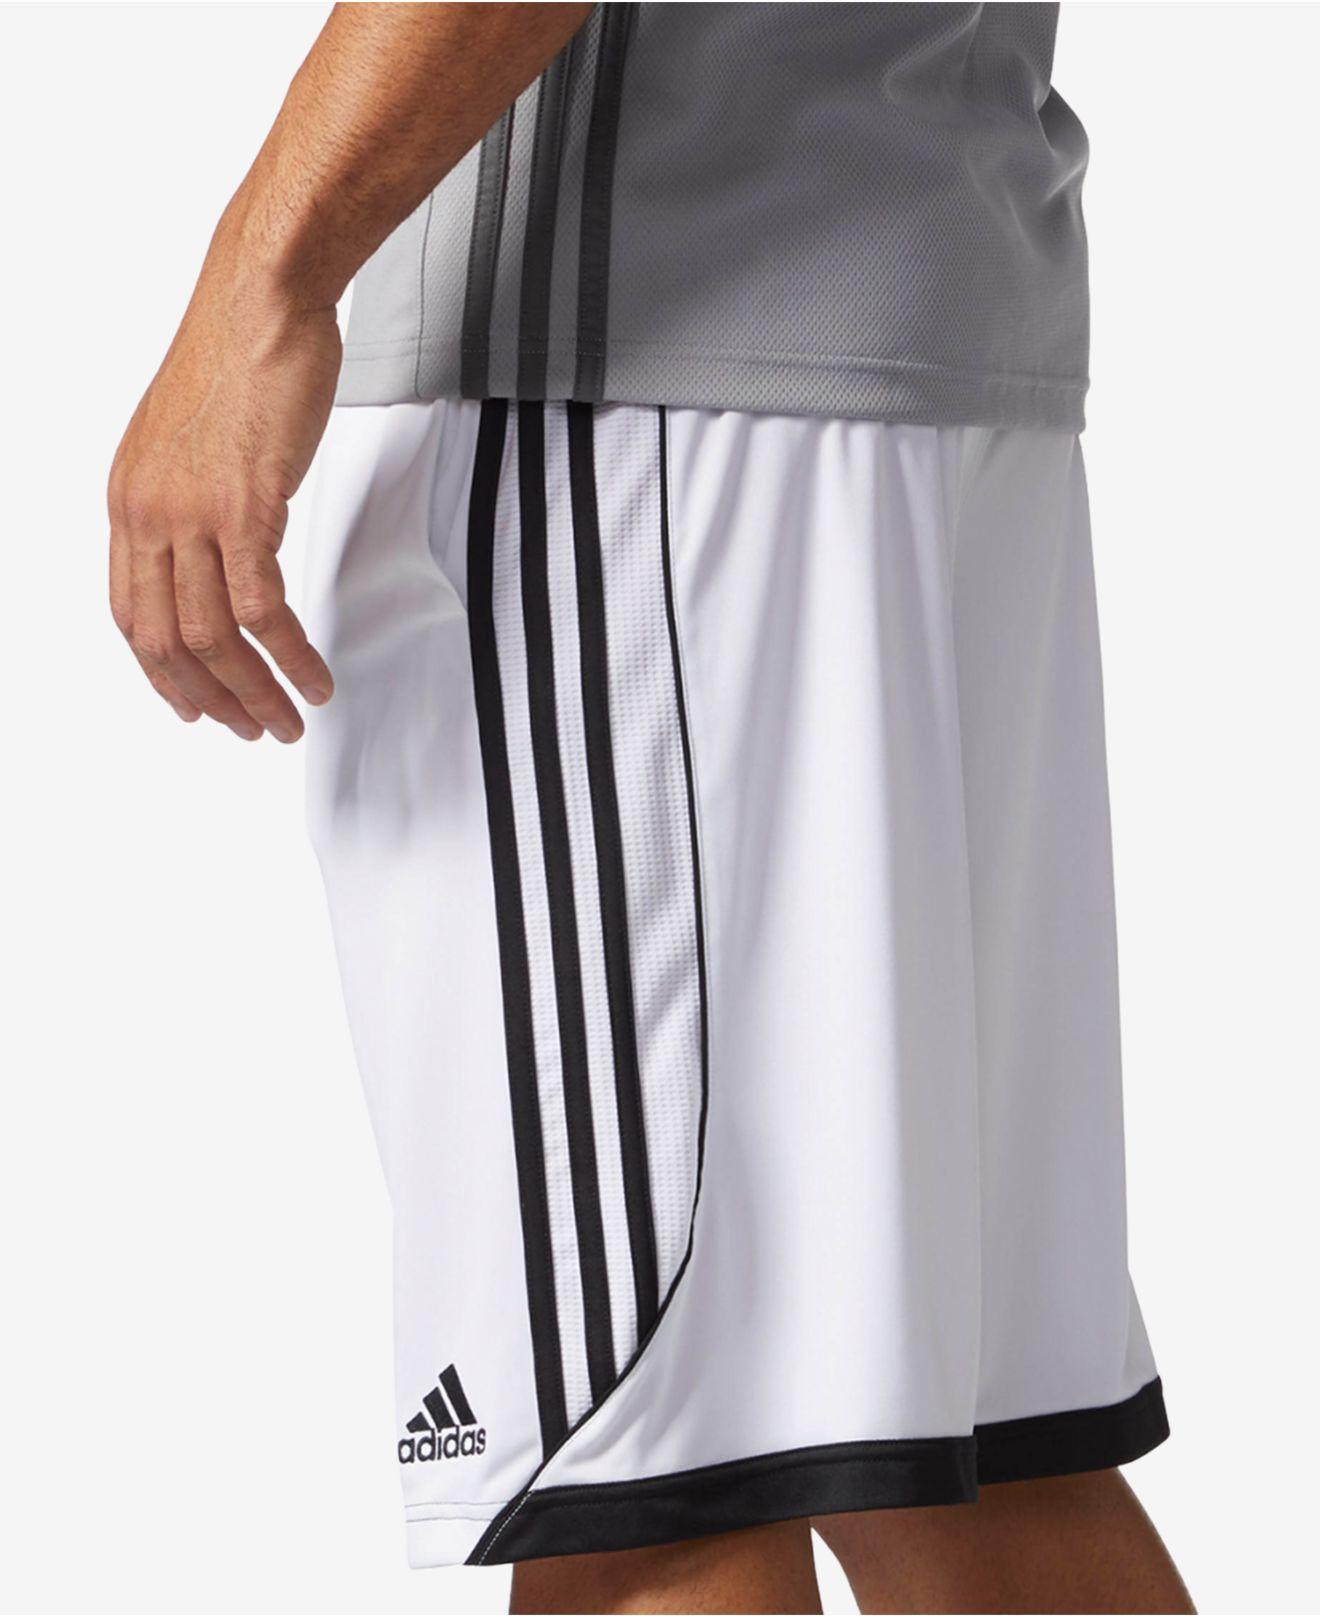 610e88aa0 Adidas - White Climalite® 3g Speed Basketball Shorts for Men - Lyst. View  fullscreen